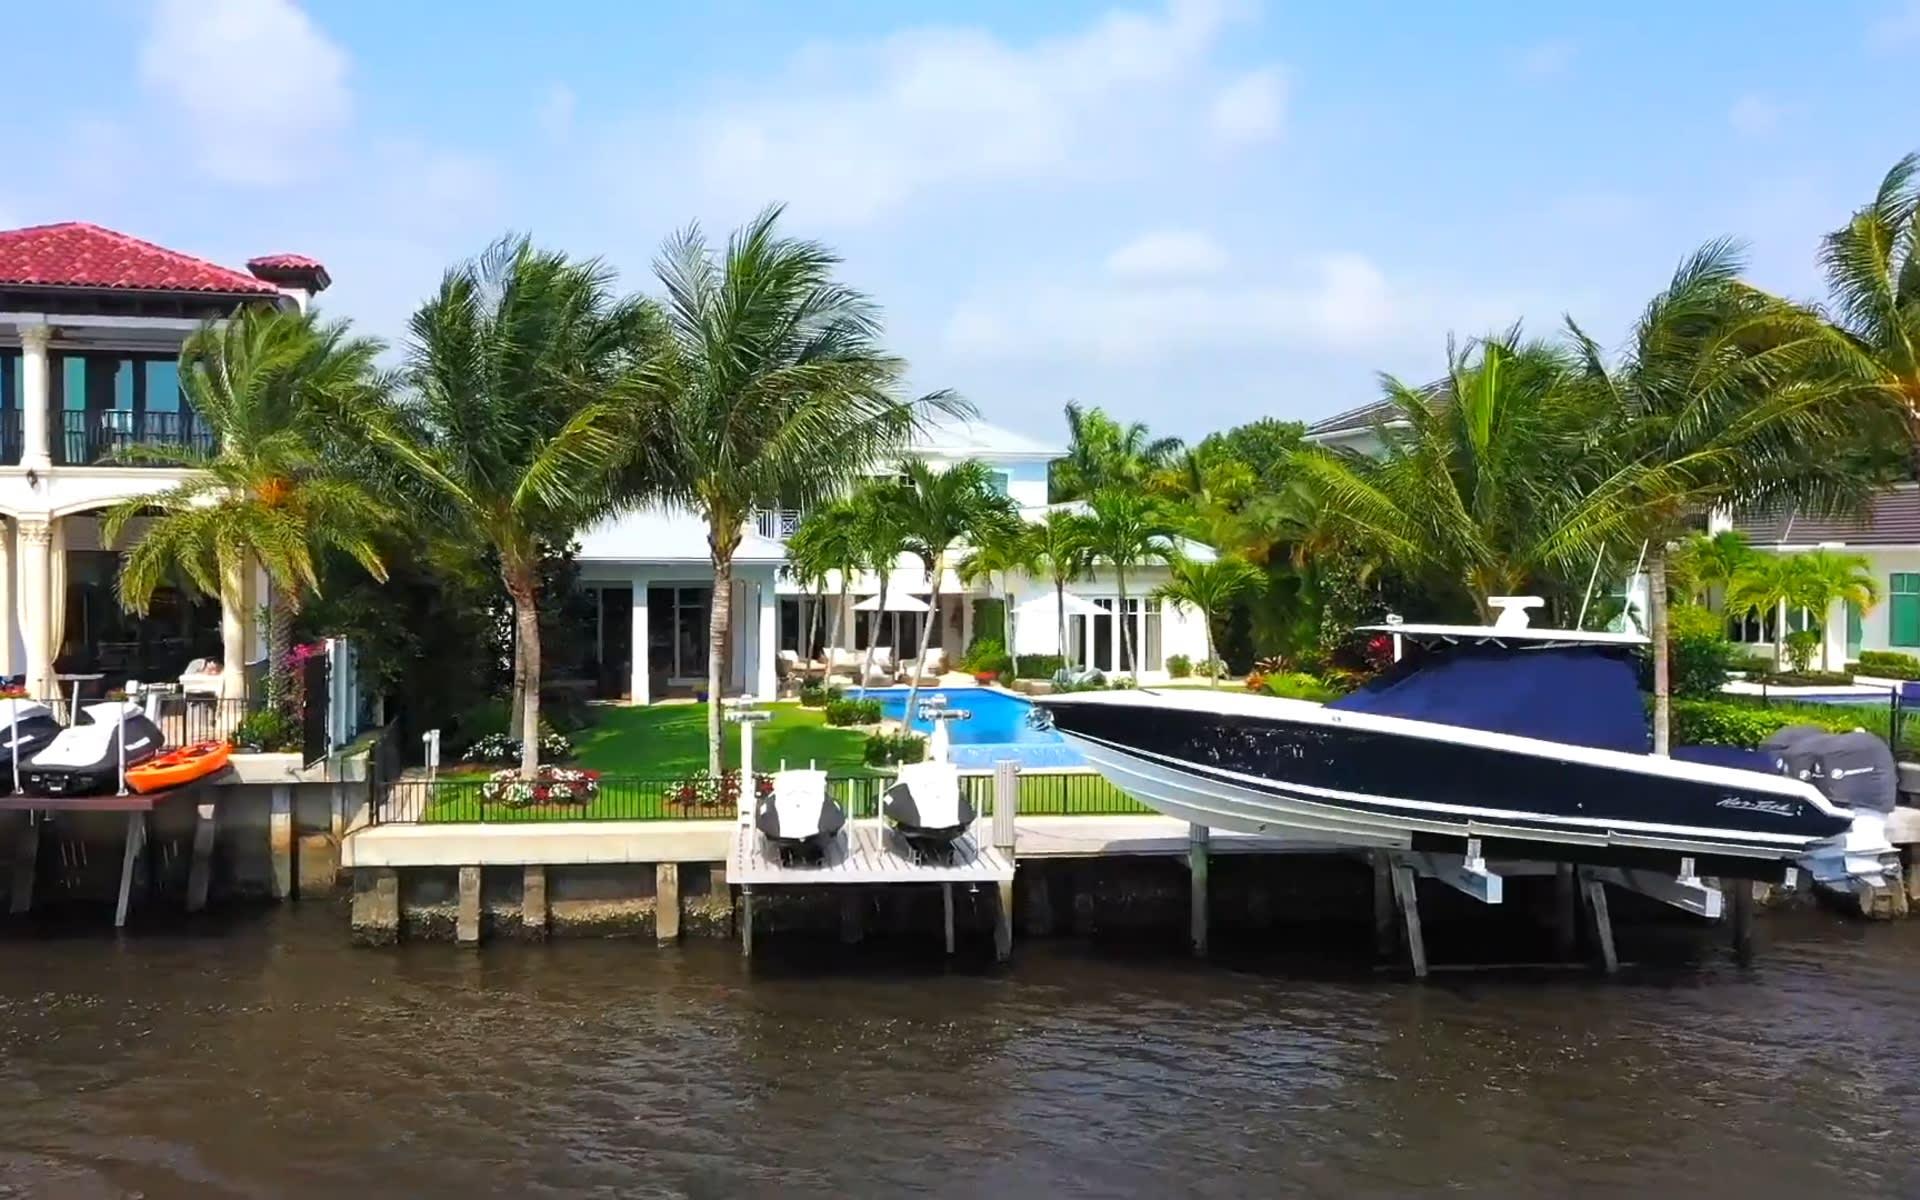 1745 Palm Trail, Delray Beach, FL video preview